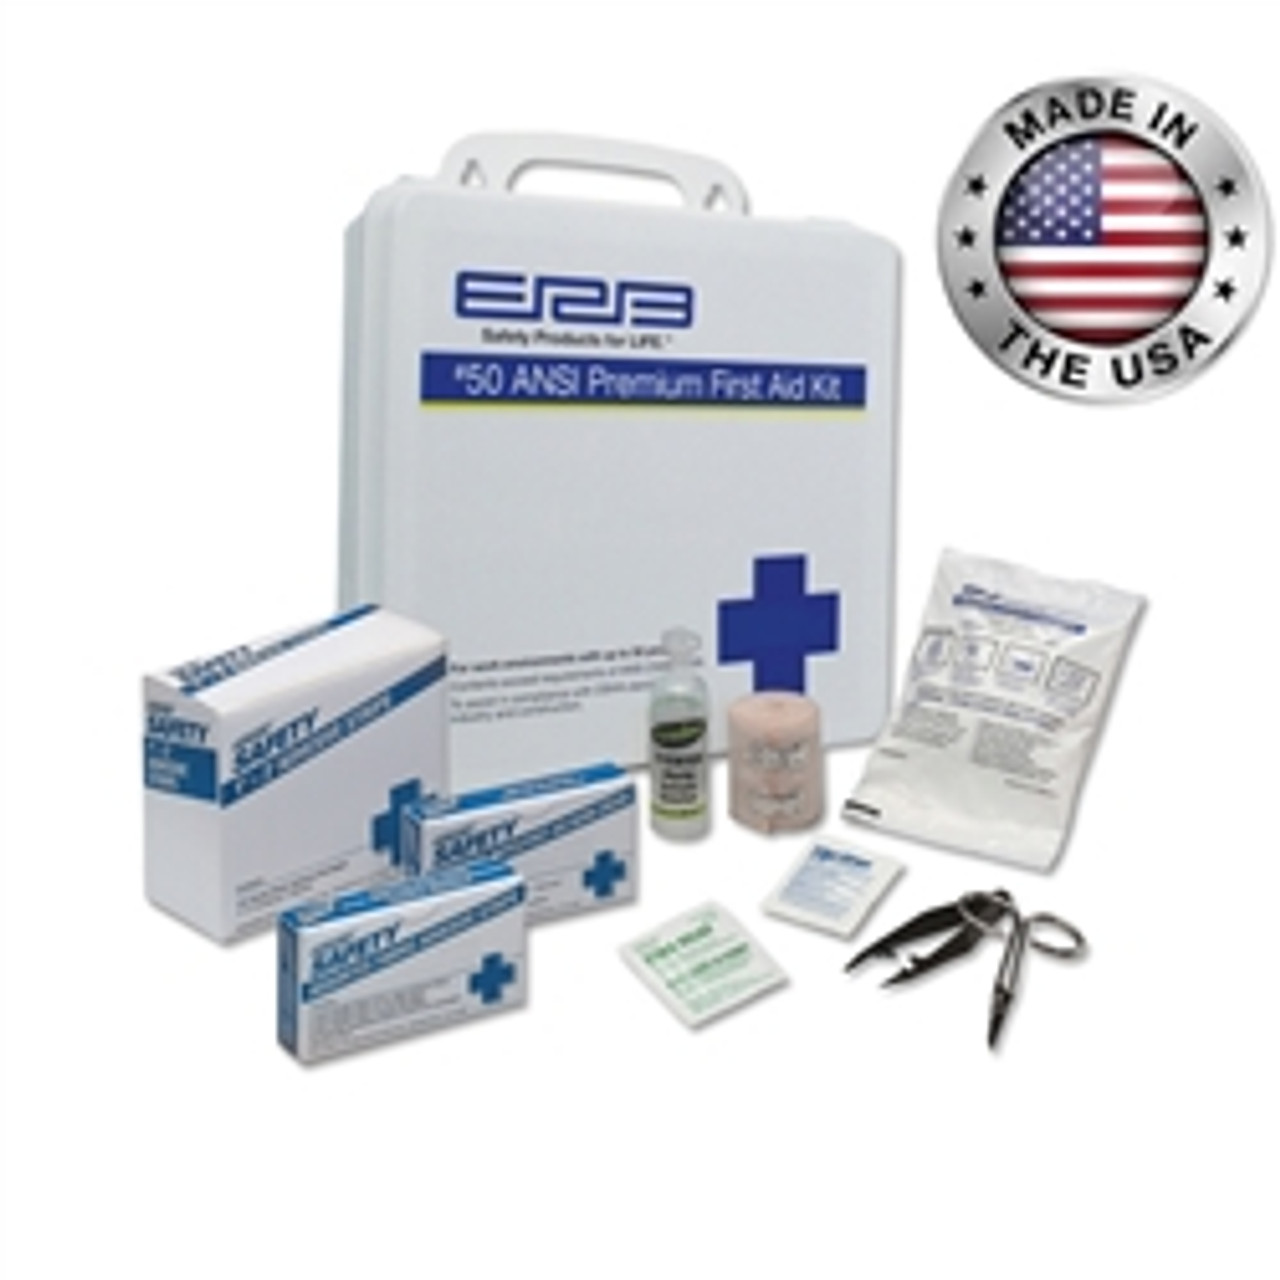 #50 ANSI Premium First Aid Kit Plastic - ERB 17136